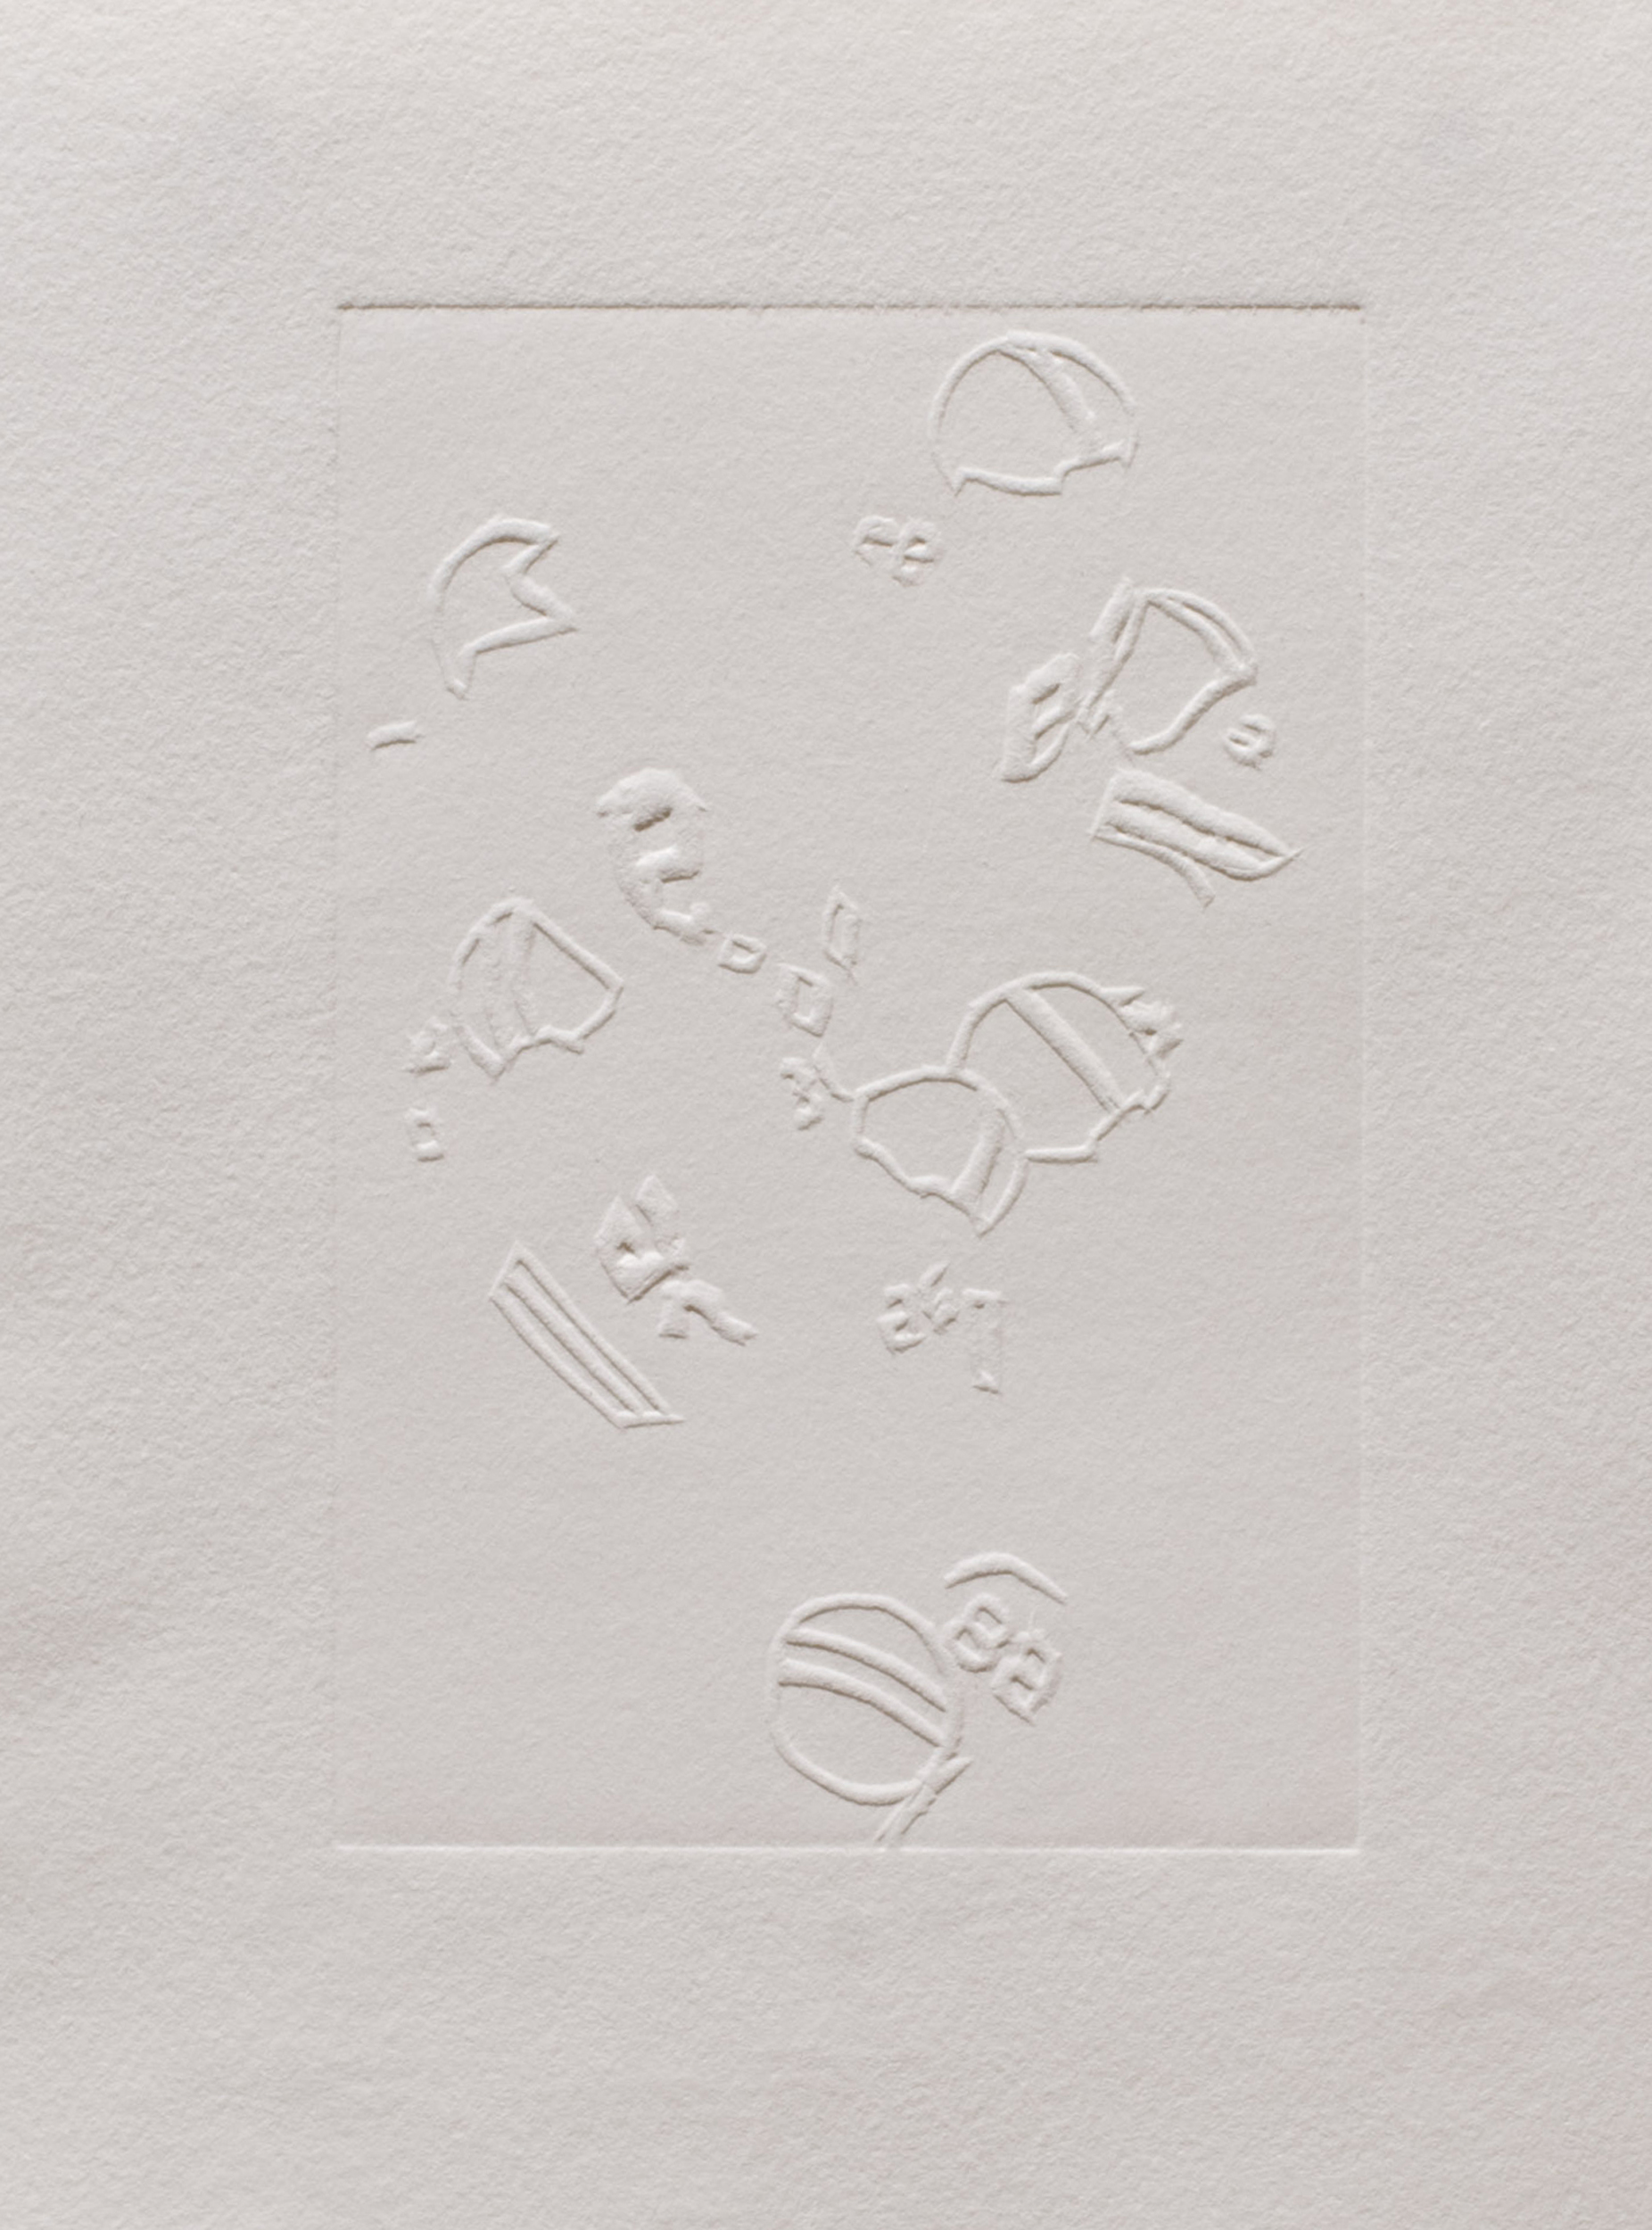 Highpoint Center for PrintmakingJerome Residency 2011–2012Jonathan McFadden, Gwendolyn Comings, Graham JuddExhibit May 25 - June 30, 2012photo by David Kernwww.davidkern.comdavid@davidkern.com612-360-0646Original Filename:120619a0037.NEF